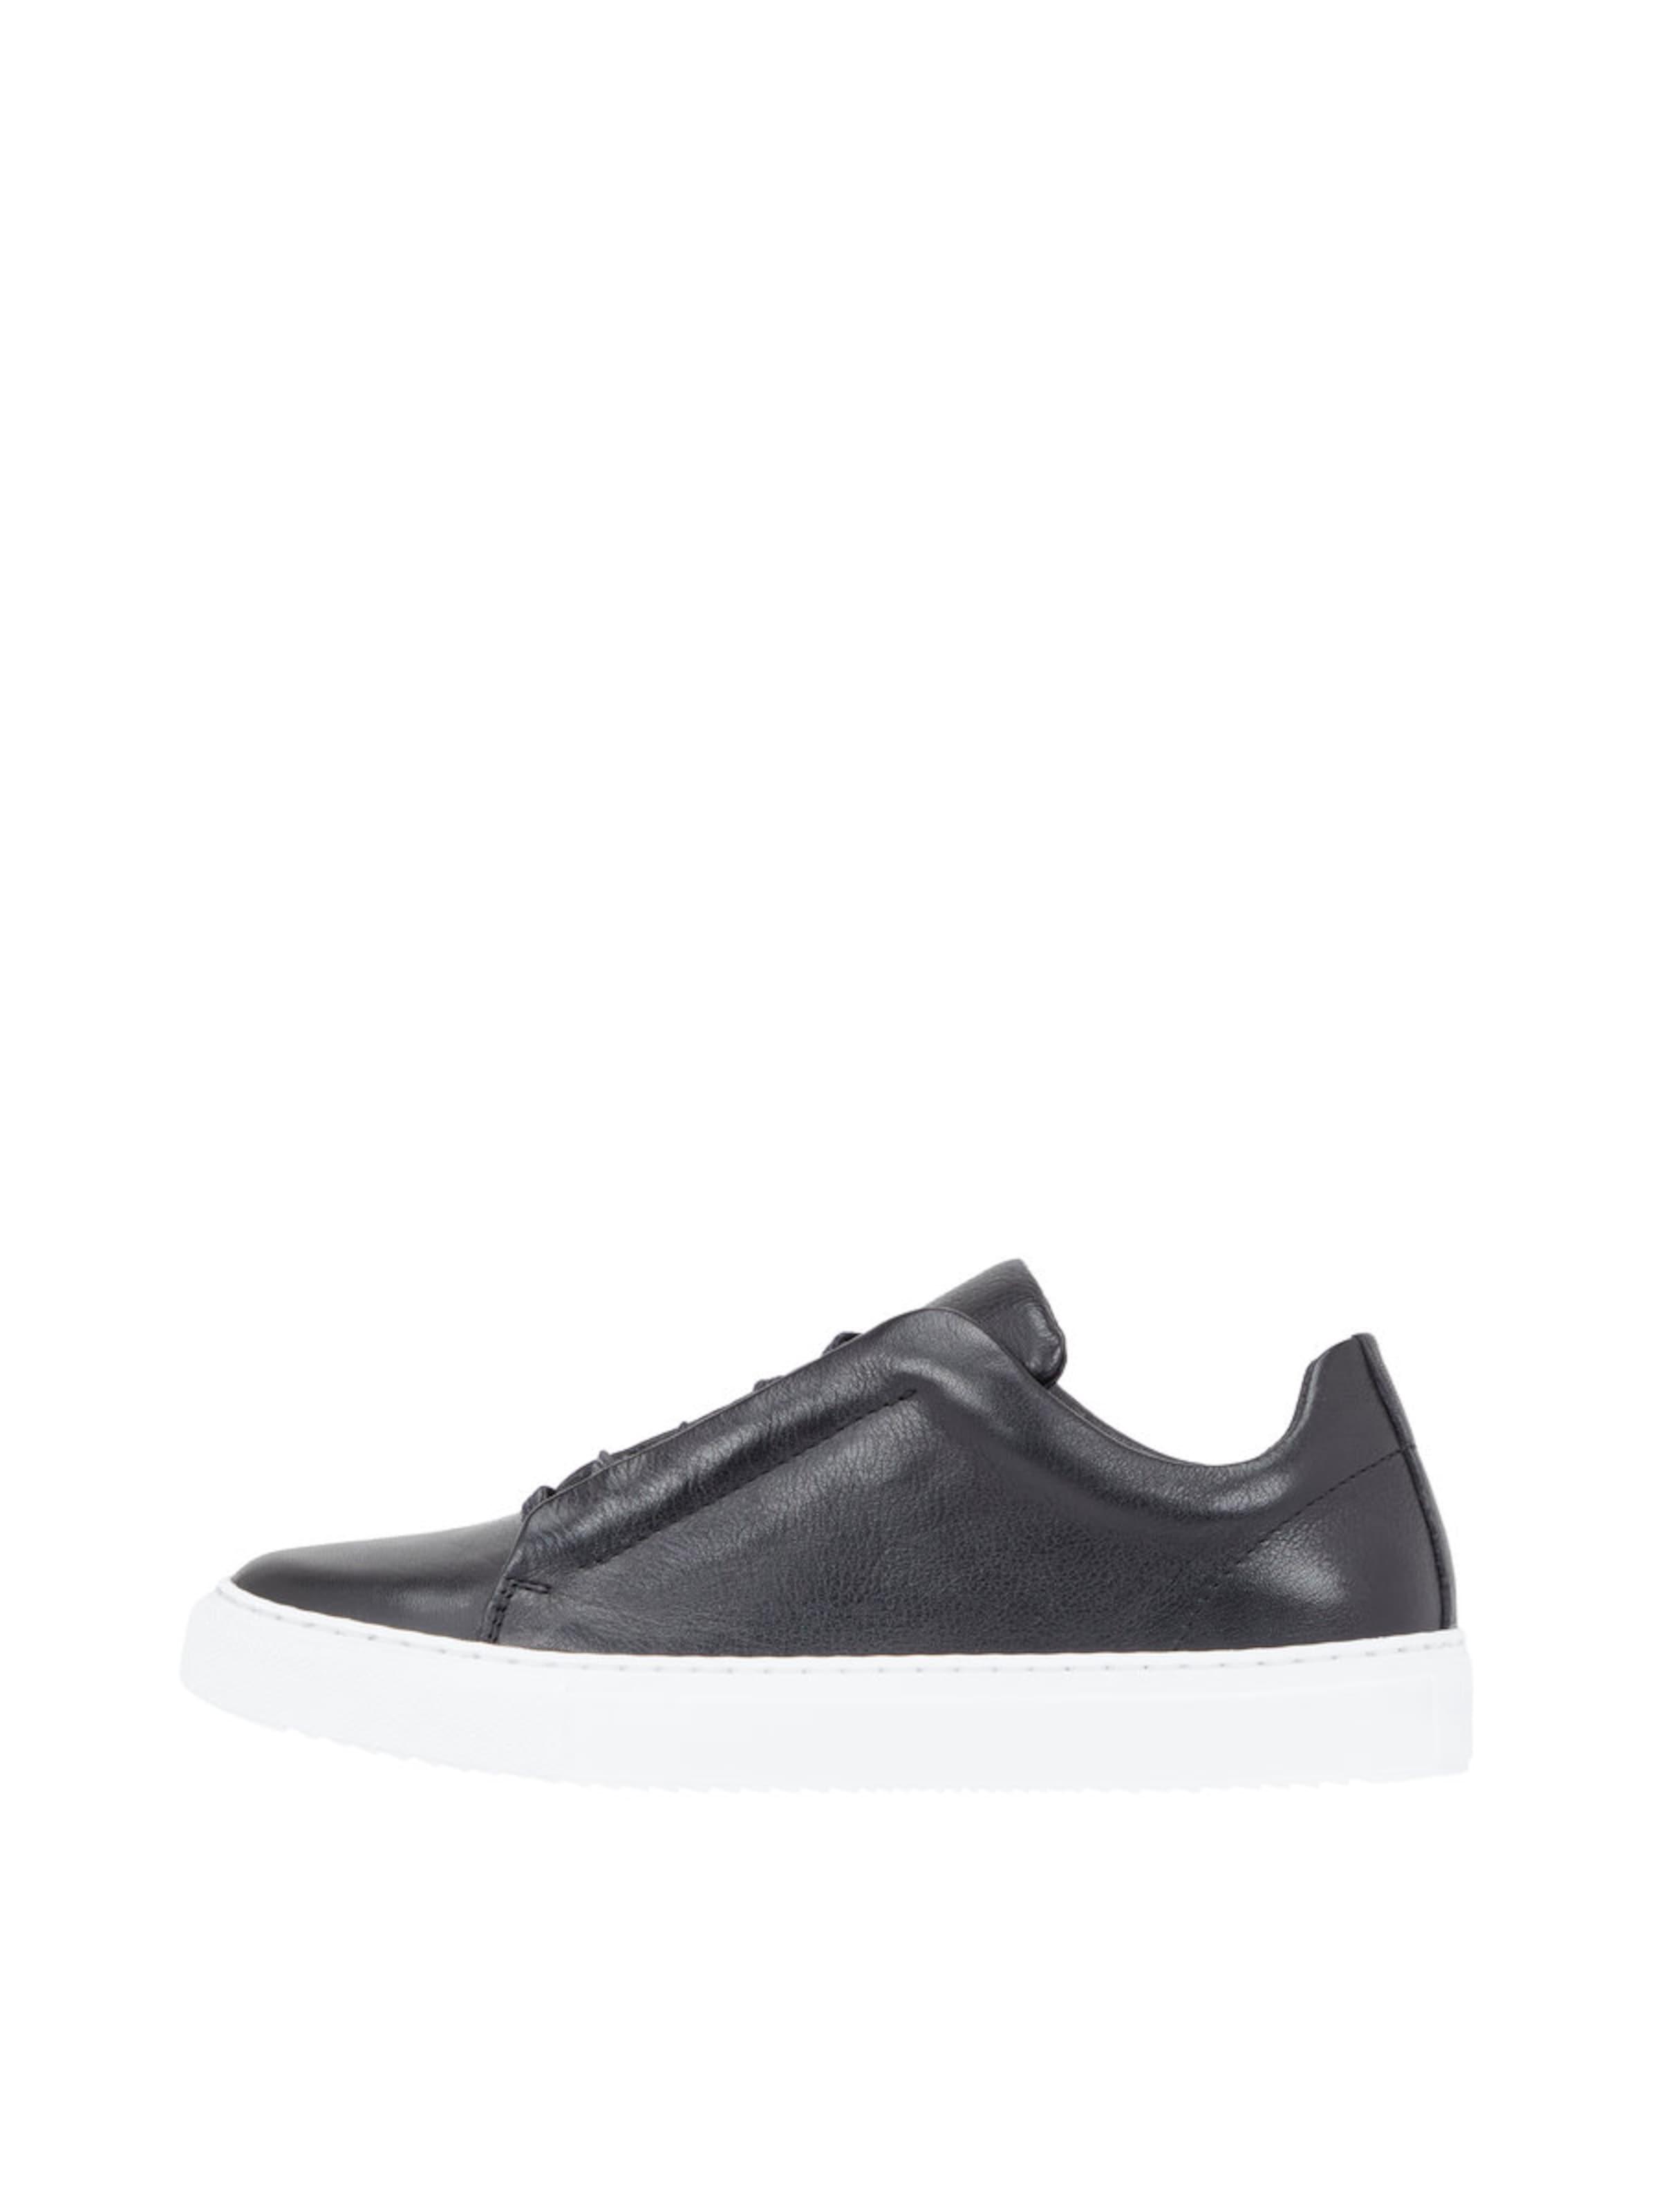 Haltbare Mode billige Schuhe Bianco   Leder Sneaker Schuhe Gut getragene Schuhe